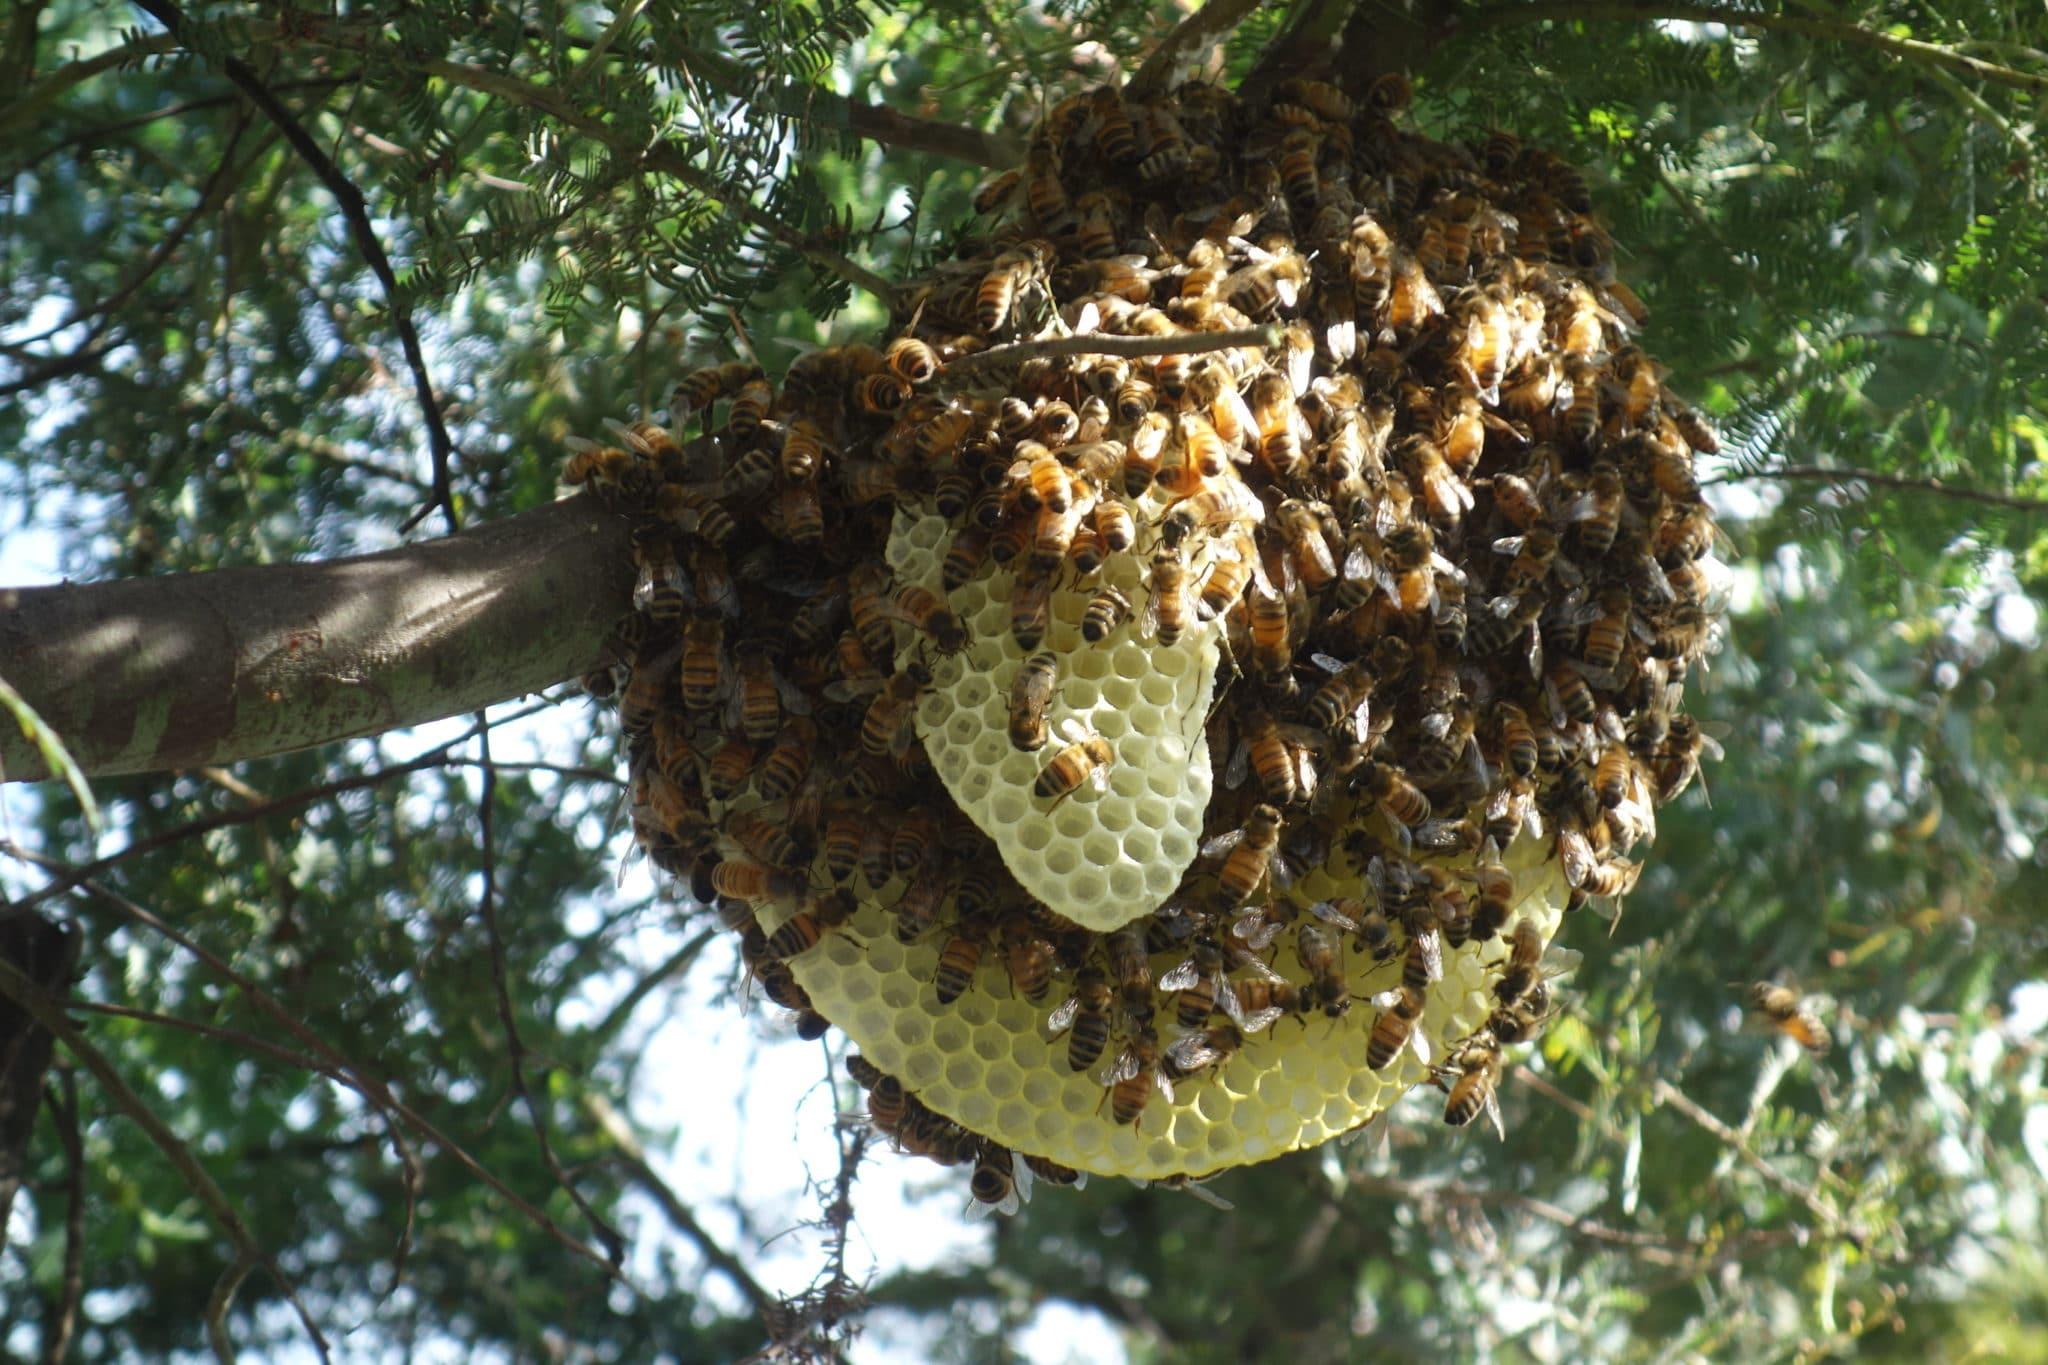 Waniassa swarm with comb 28 October 2016